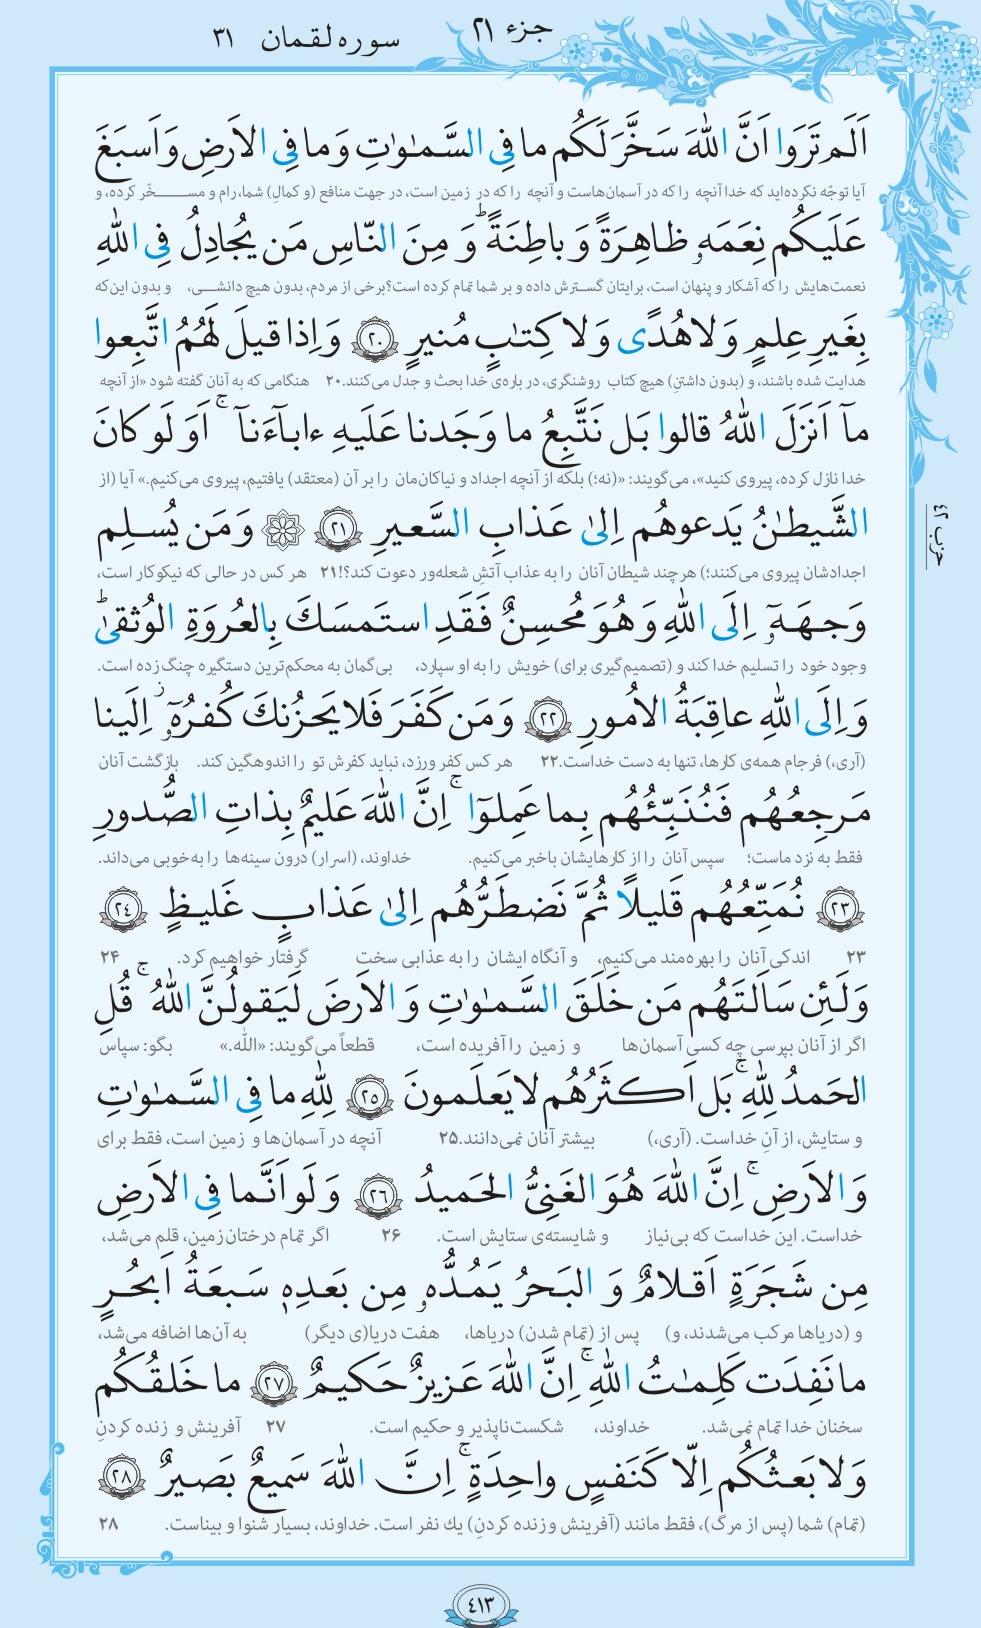 13990416000892 Test NewPhotoFree - ترتیل صفحه ۴۱۳ قرآن باصدای مصطفی اسماعیل+صوت و متن